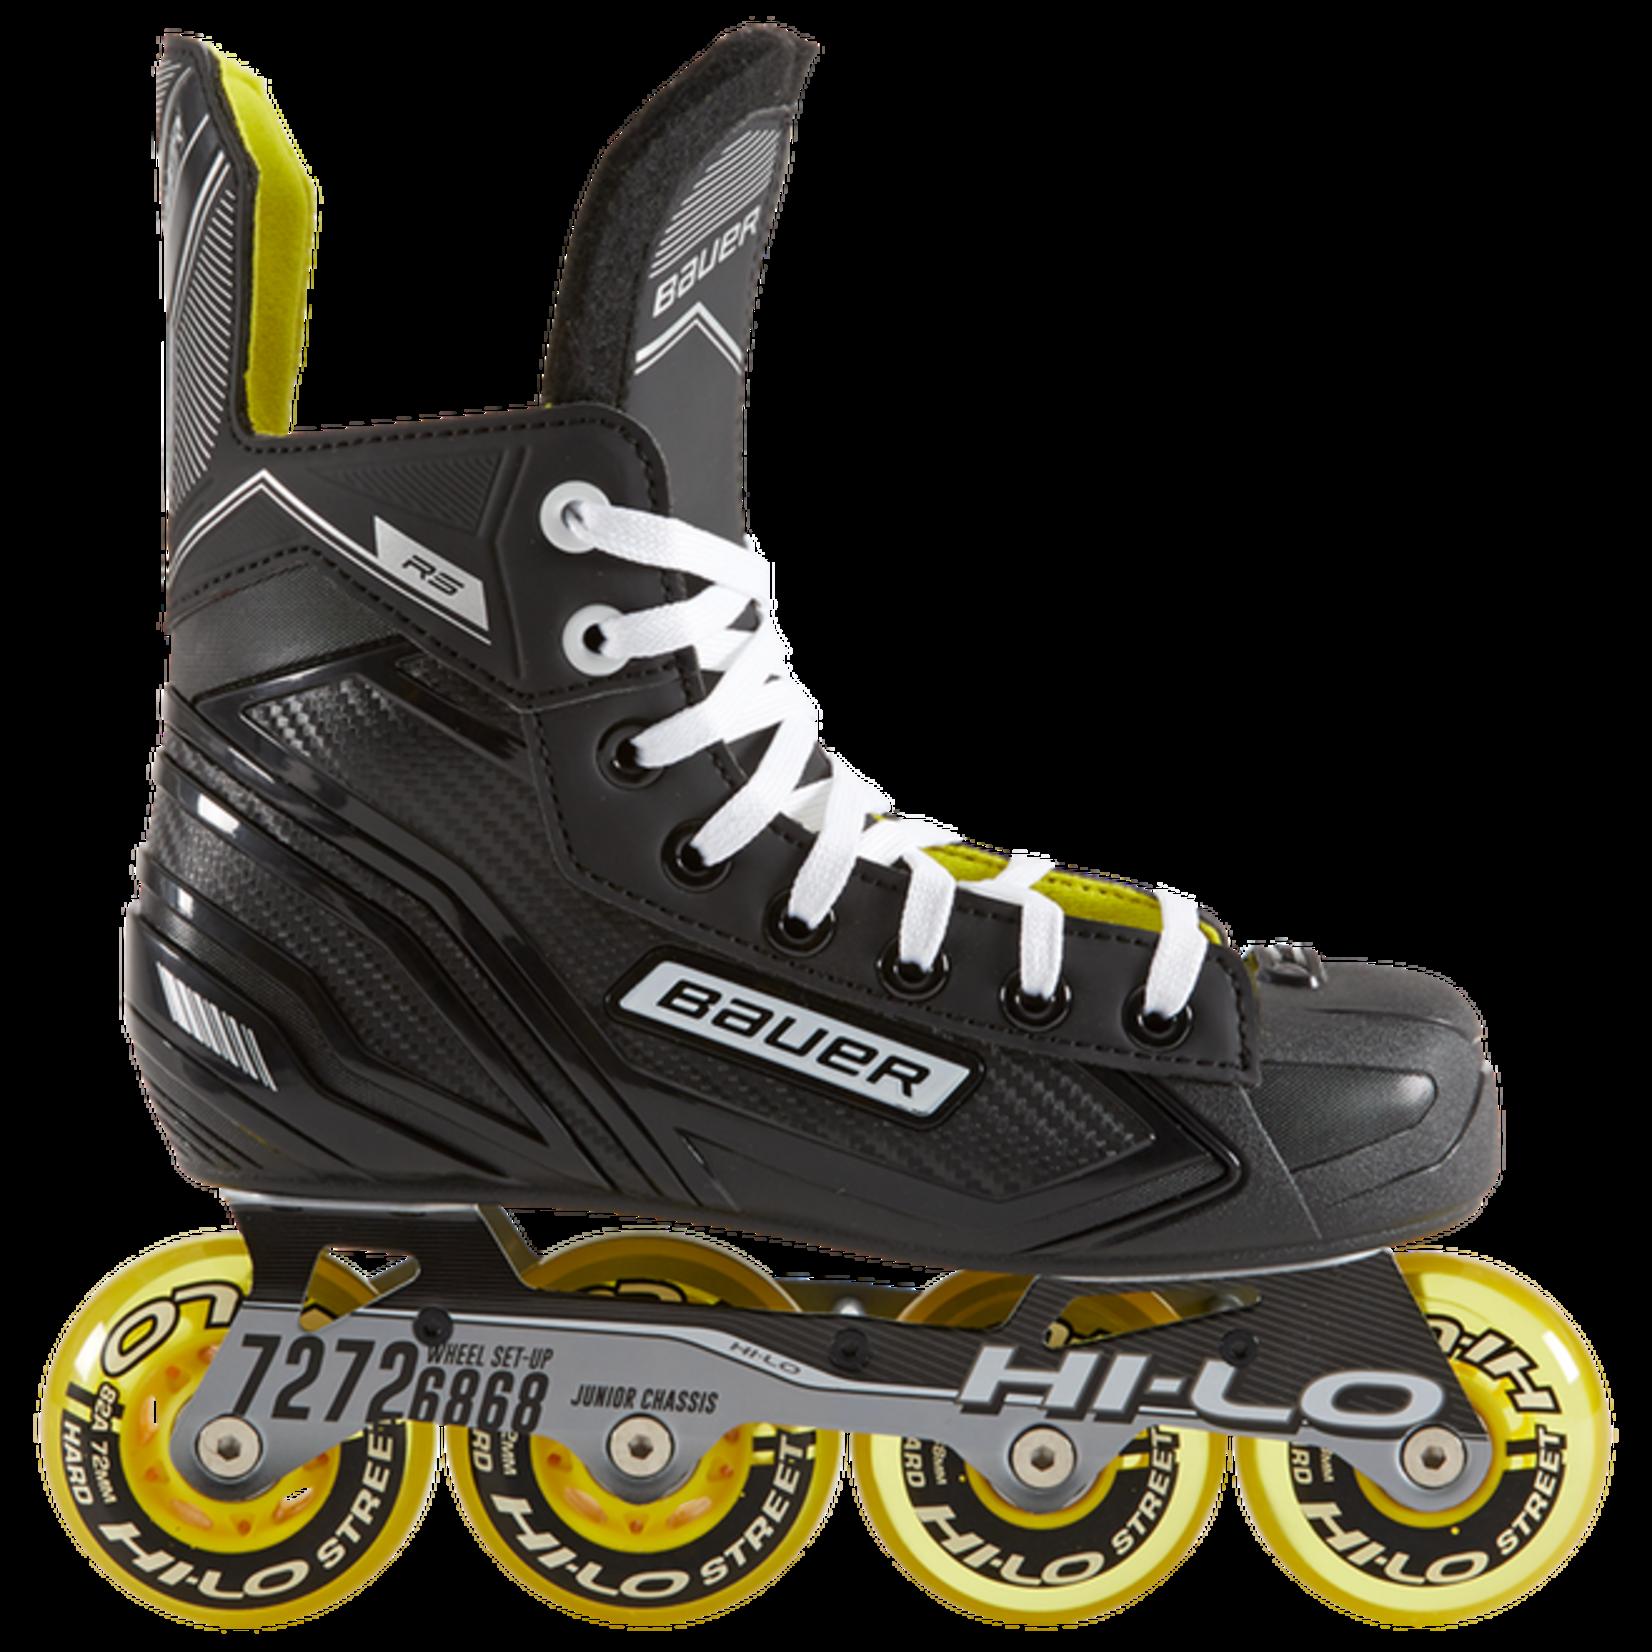 Bauer Bauer RH RS Skate Jr